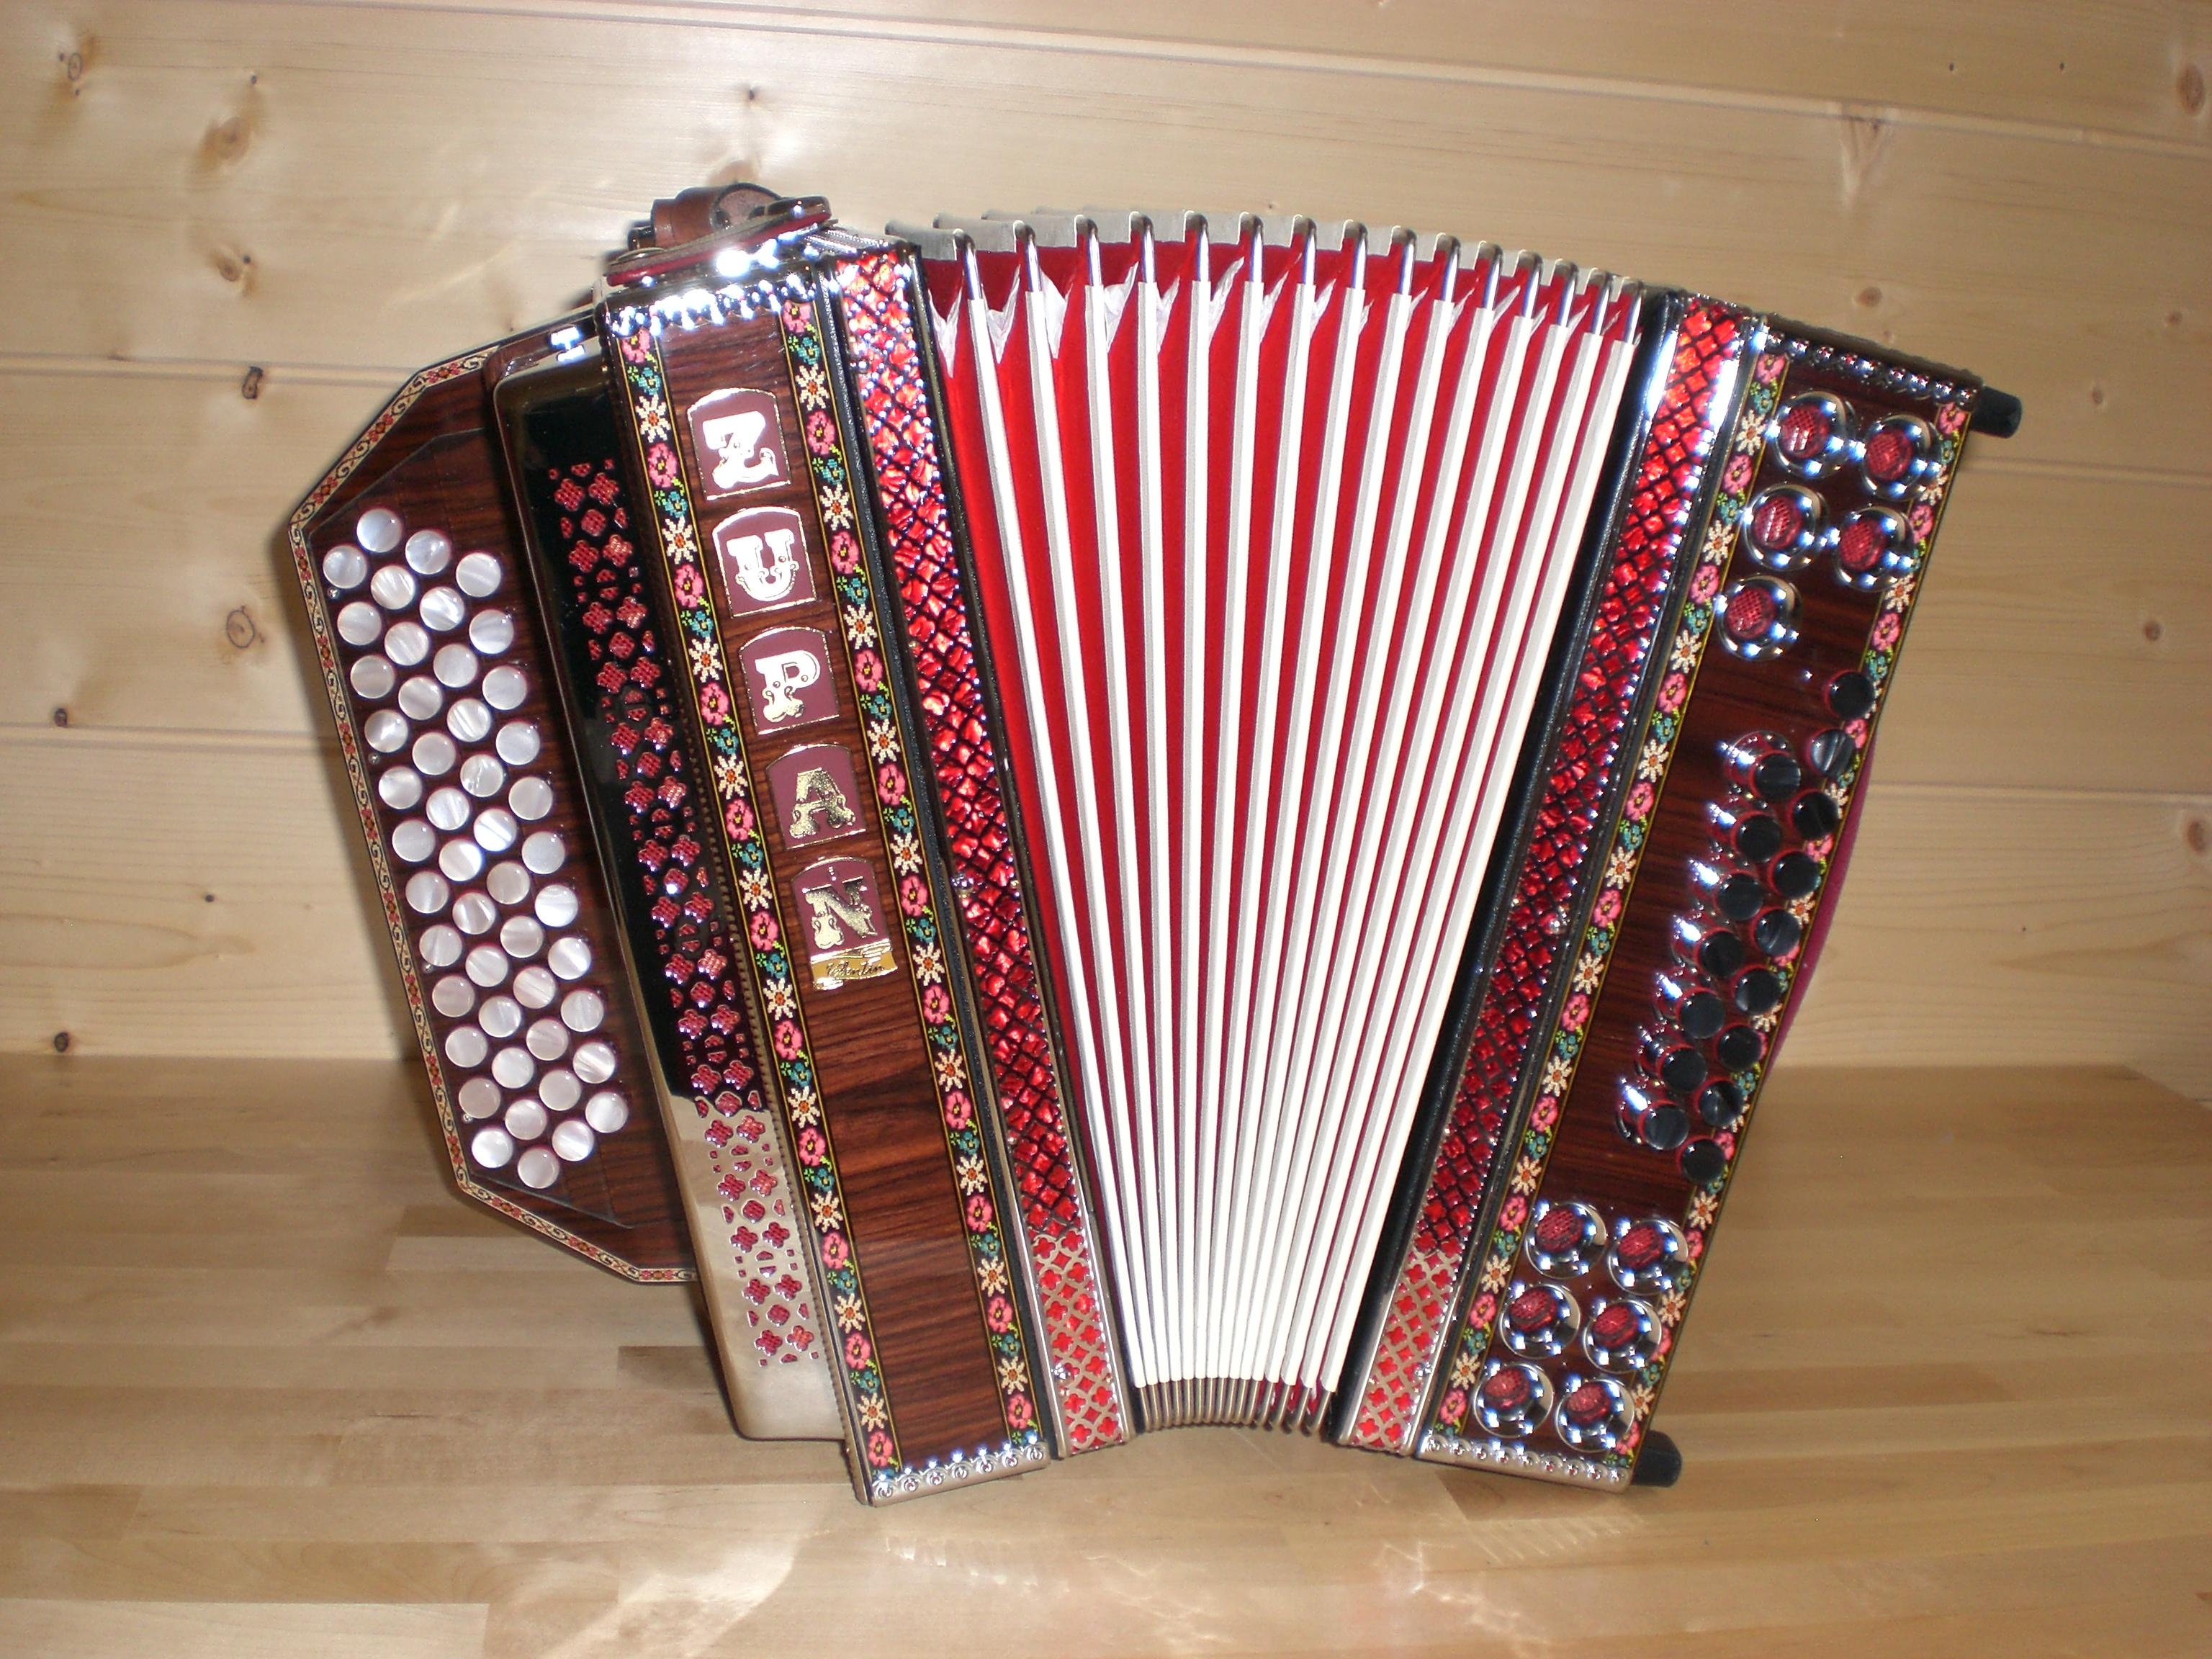 Steirische Harmonika Zupan Alpe Ivd Palisander Harmonikaland